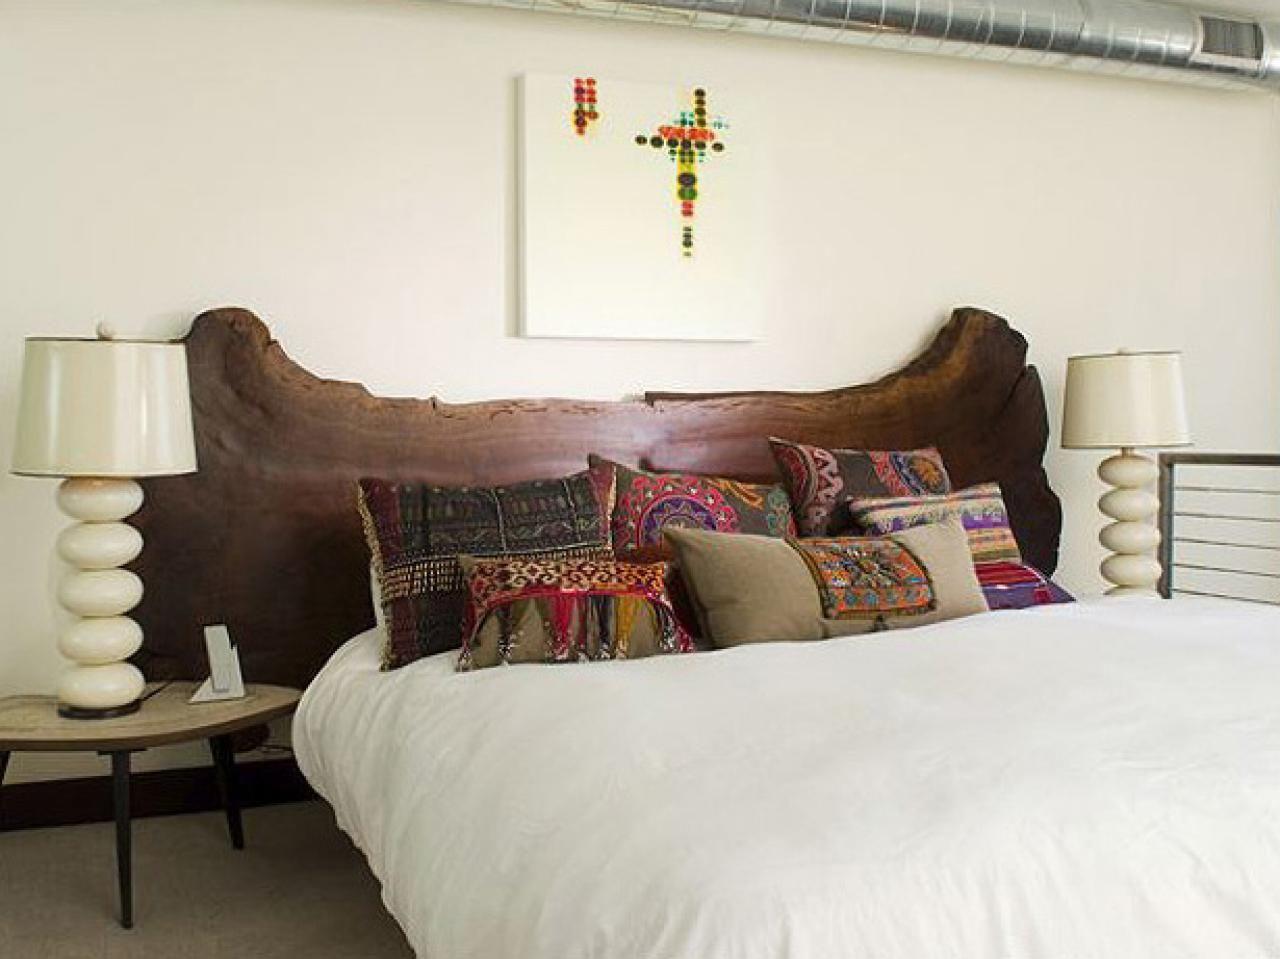 Creative Upcycled Headboard Ideas Bedroom Decorating